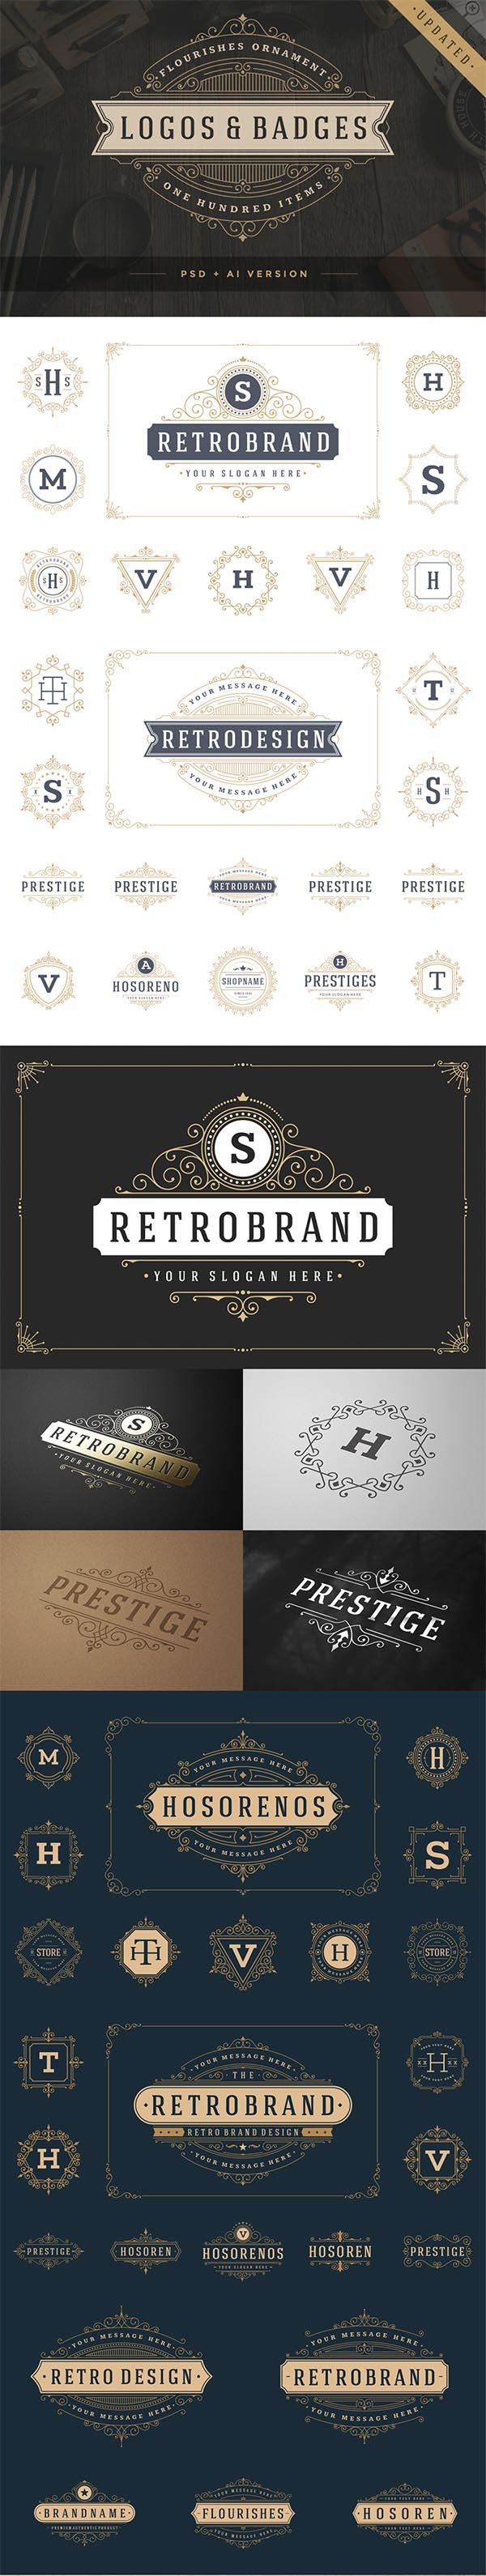 700 Retro Vintage Logotypes and Badges - 3